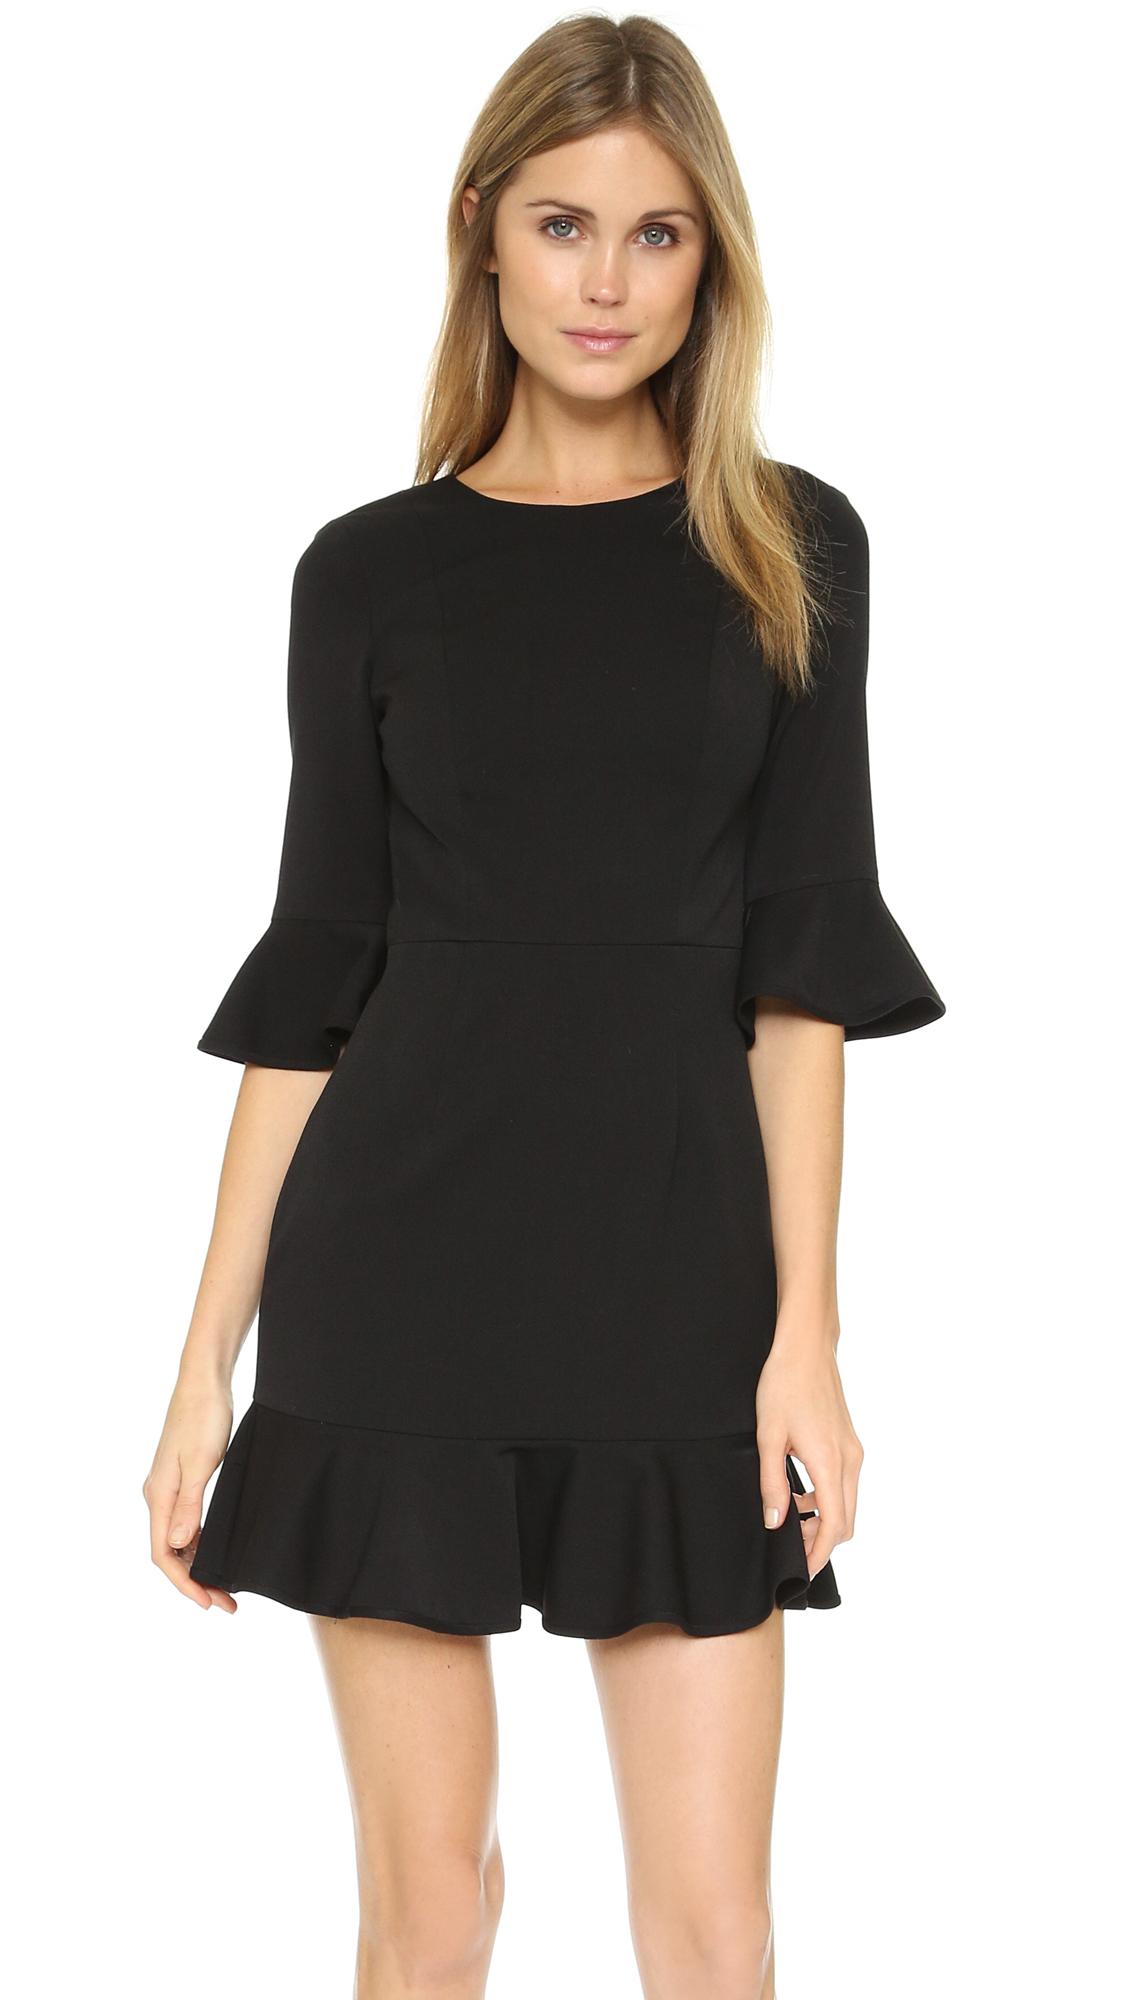 Black halo black dress